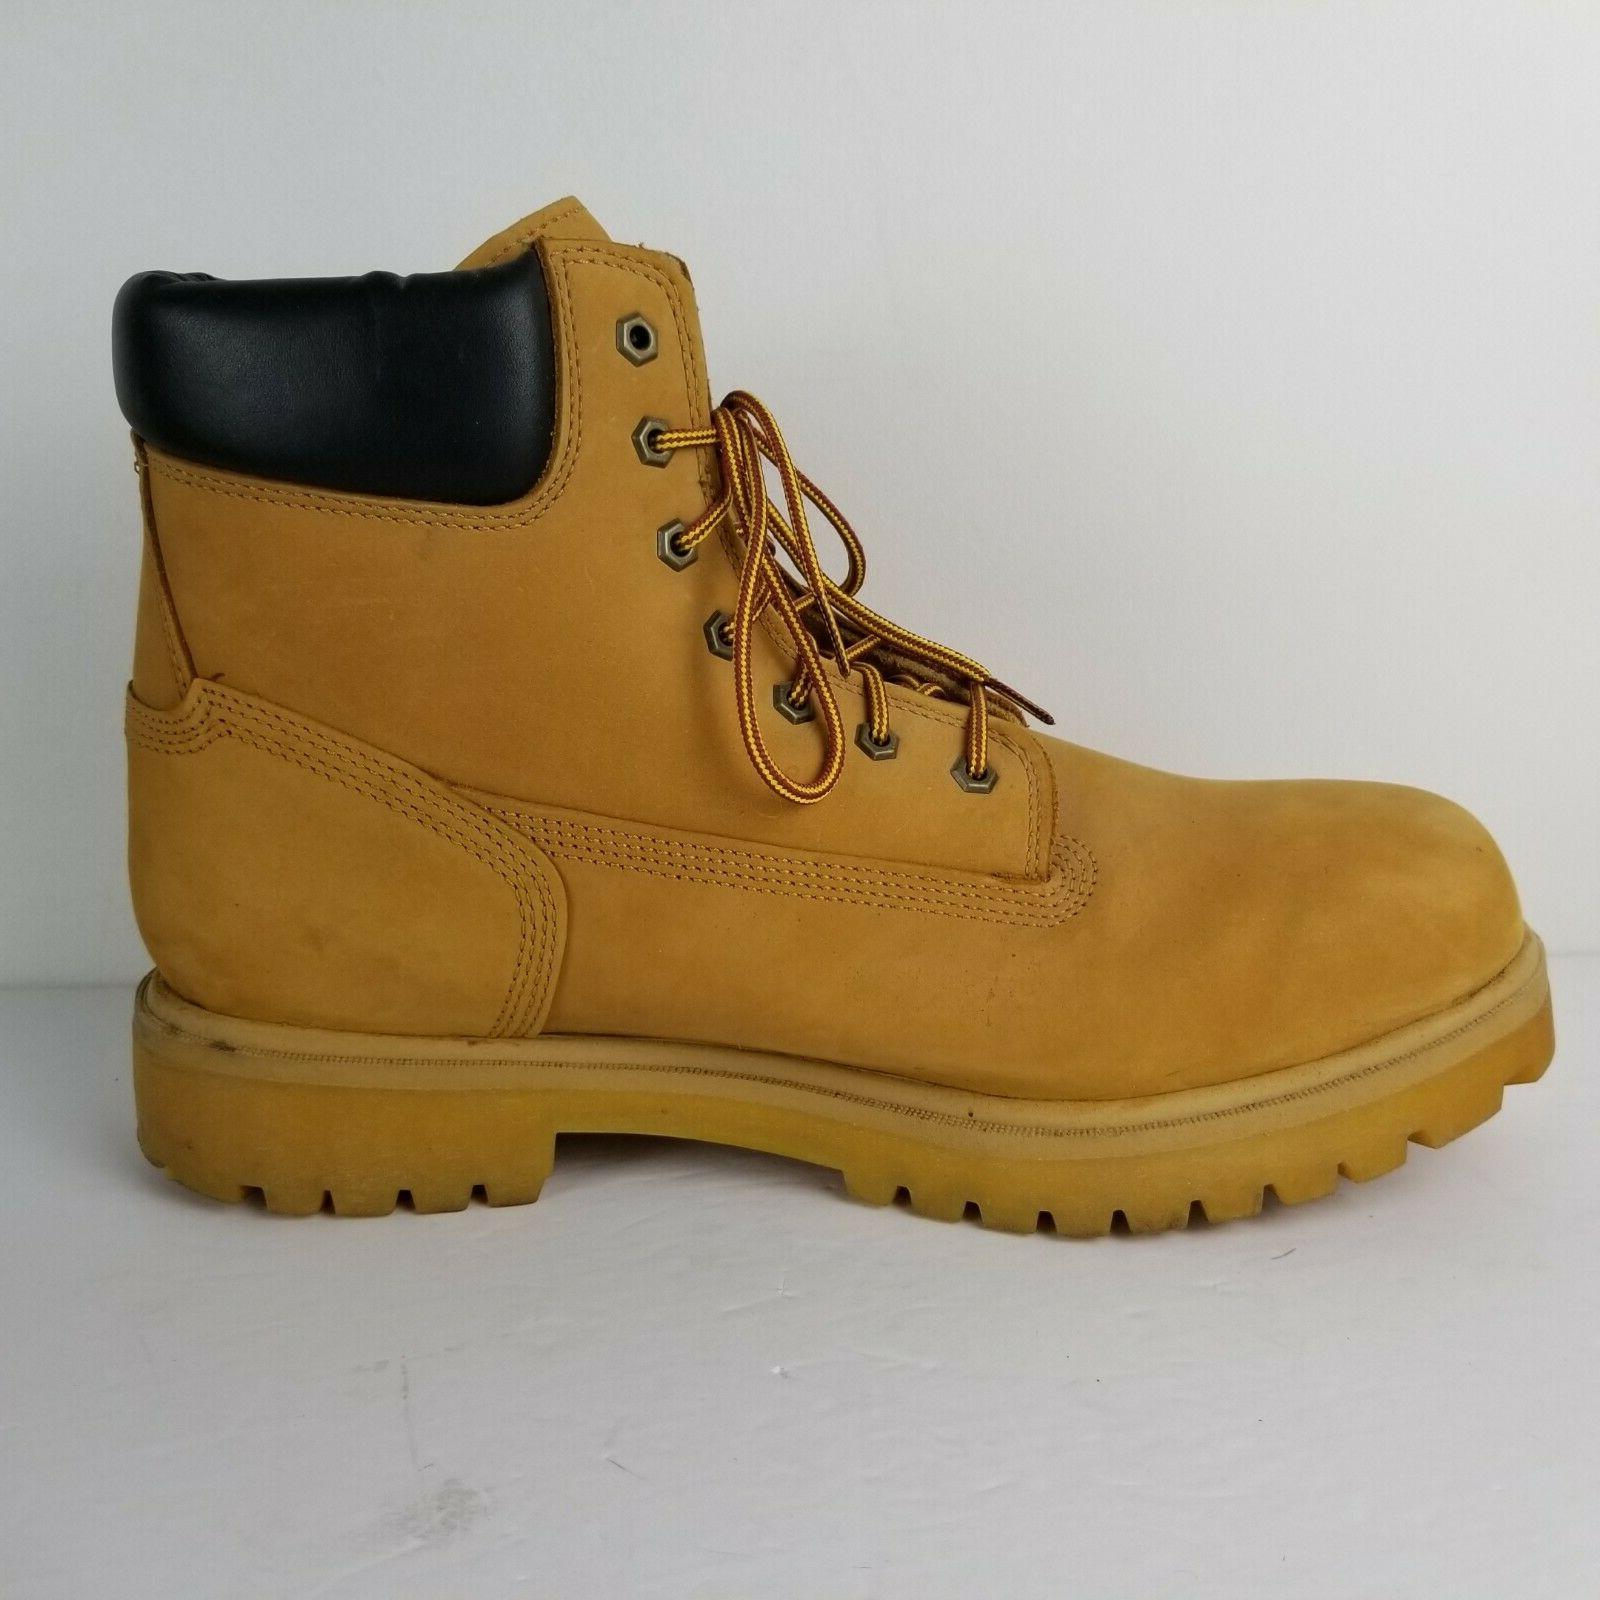 TIMBERLAND Direct Attach Waterproof Wheat Boots 15 M